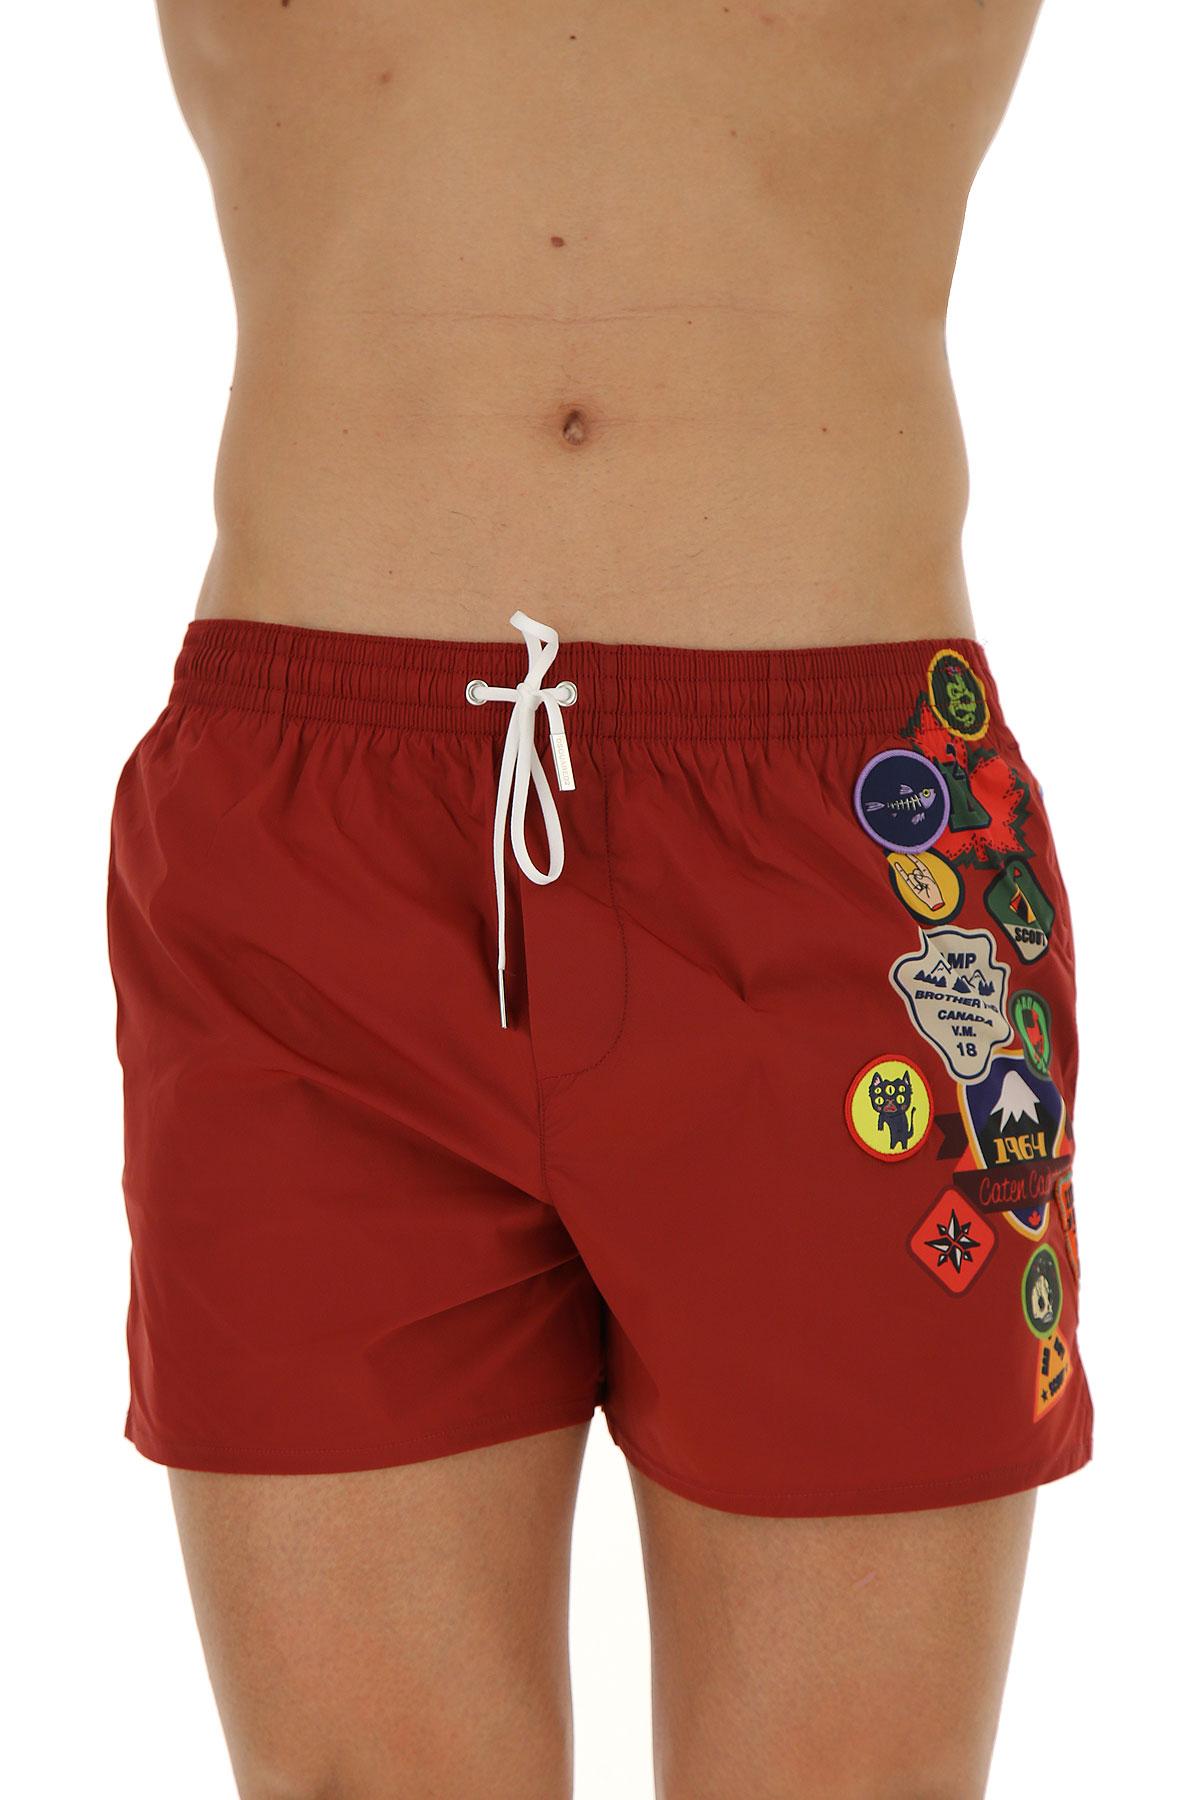 de7edeb47c Mens Swimwear Dsquared2, Style code: b7b641820-400-